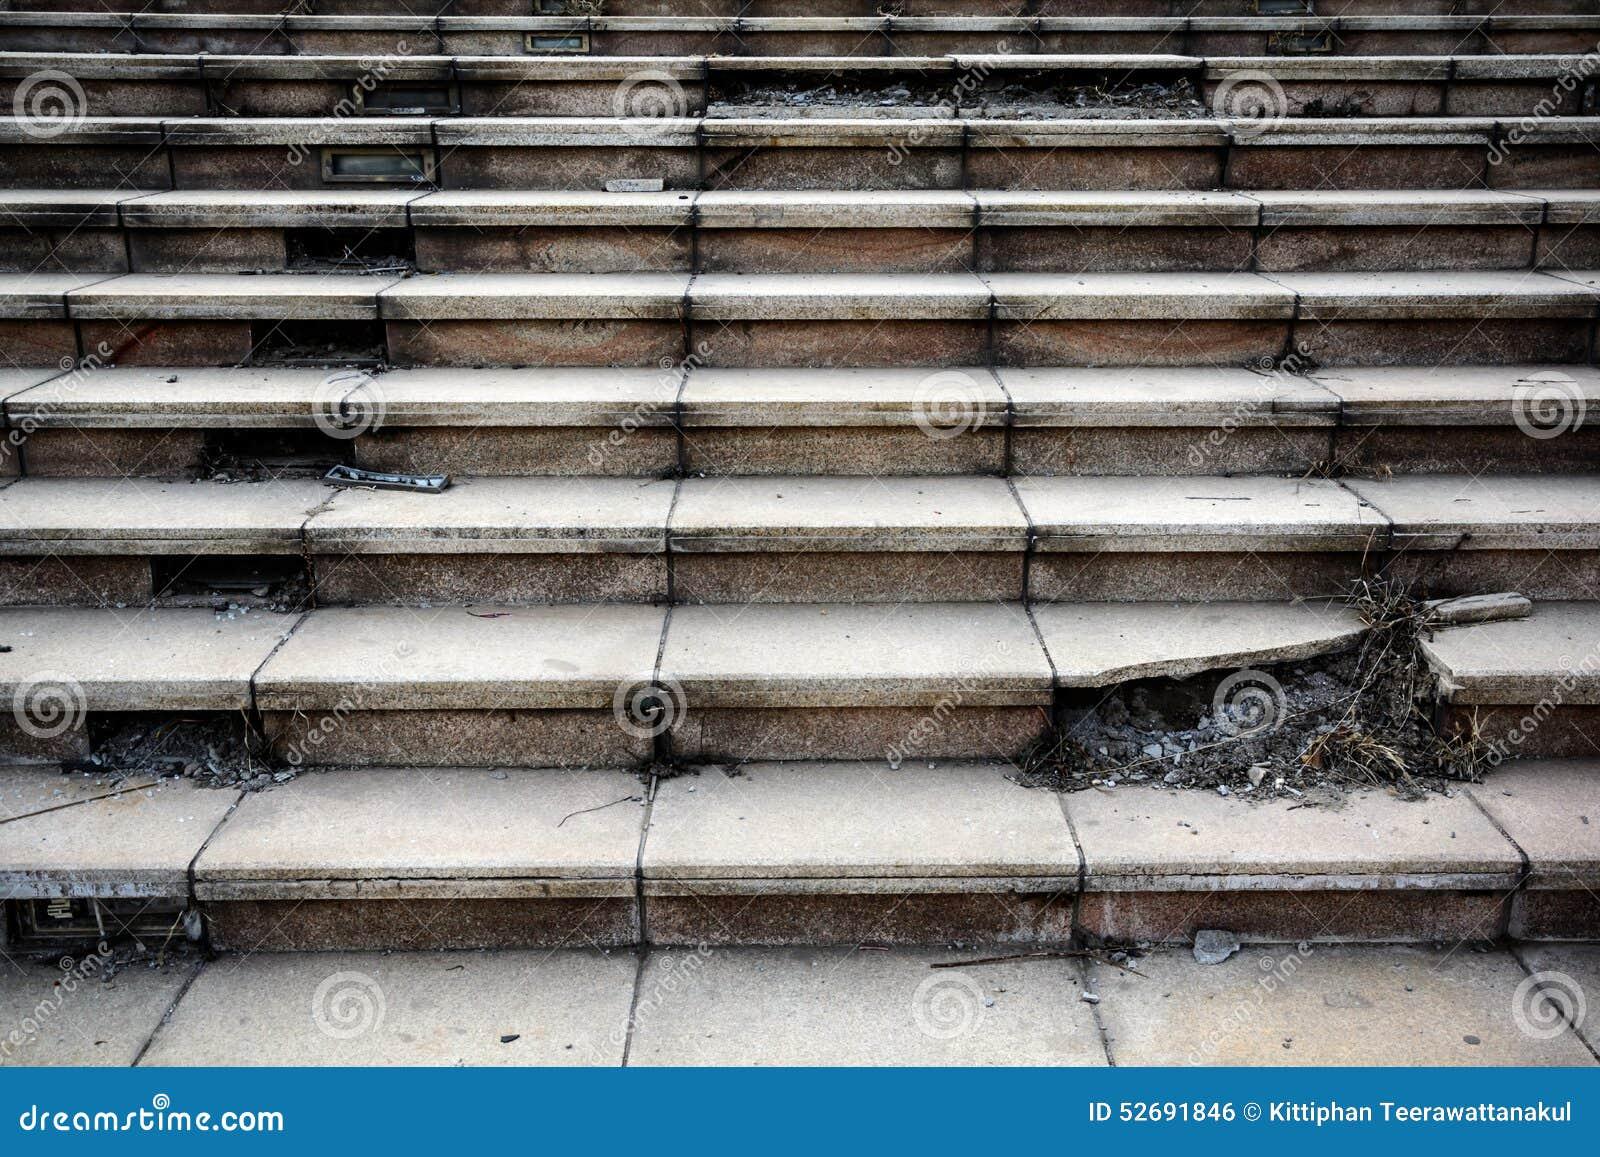 Old broken concrete staircase step